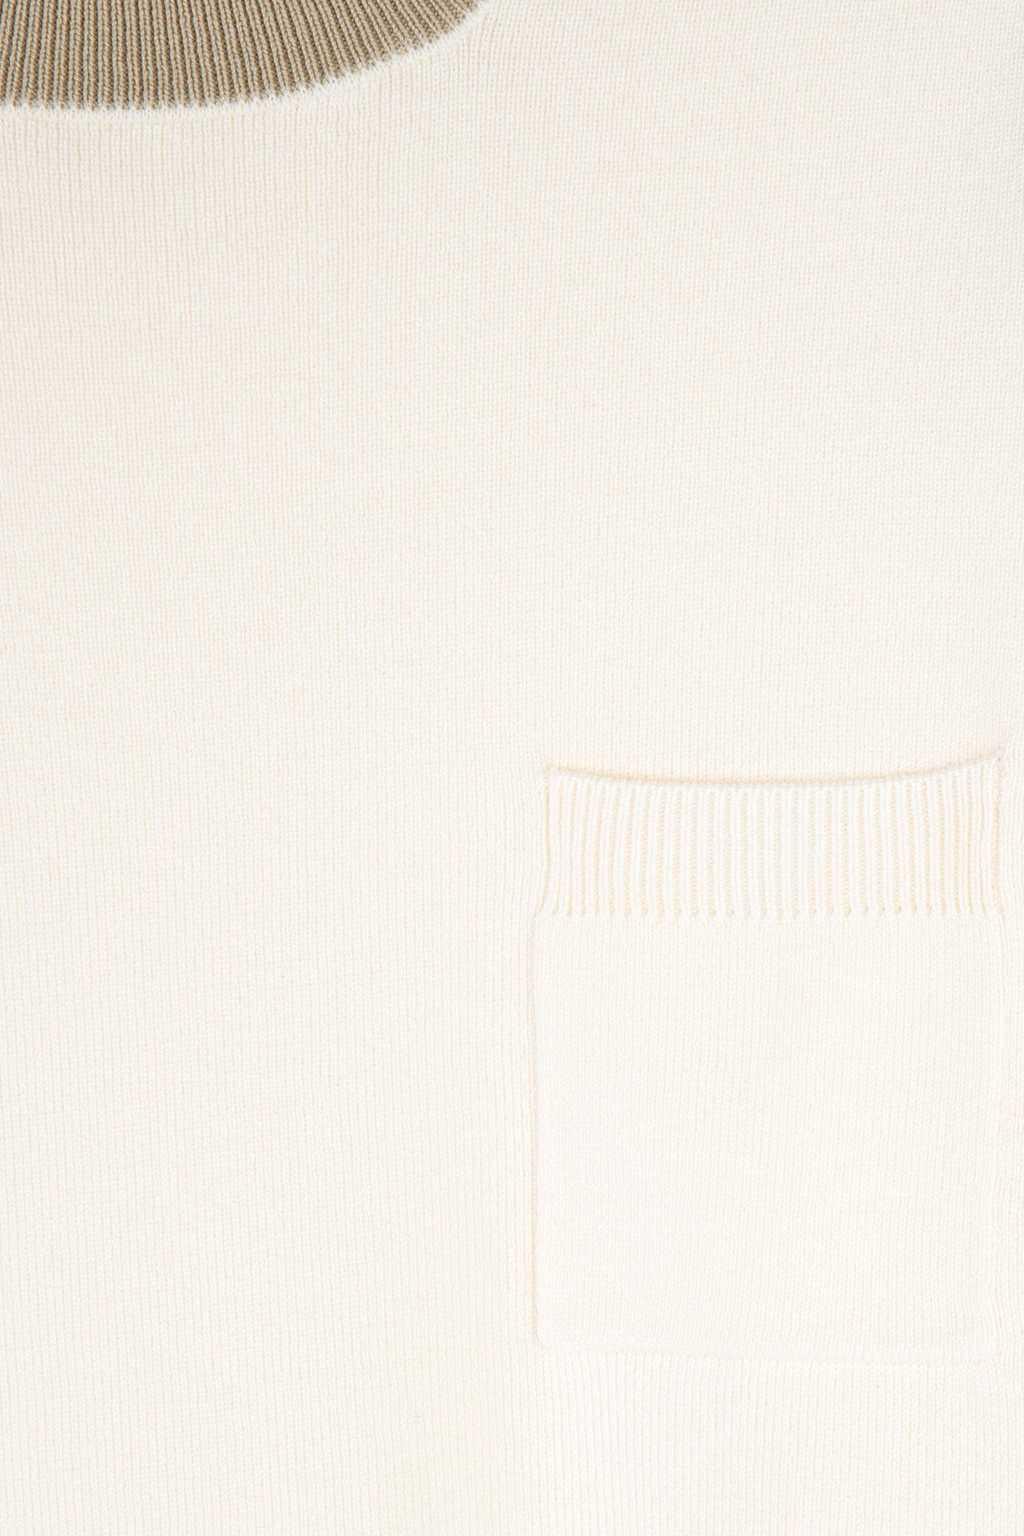 Sweater 3070 Cream 6